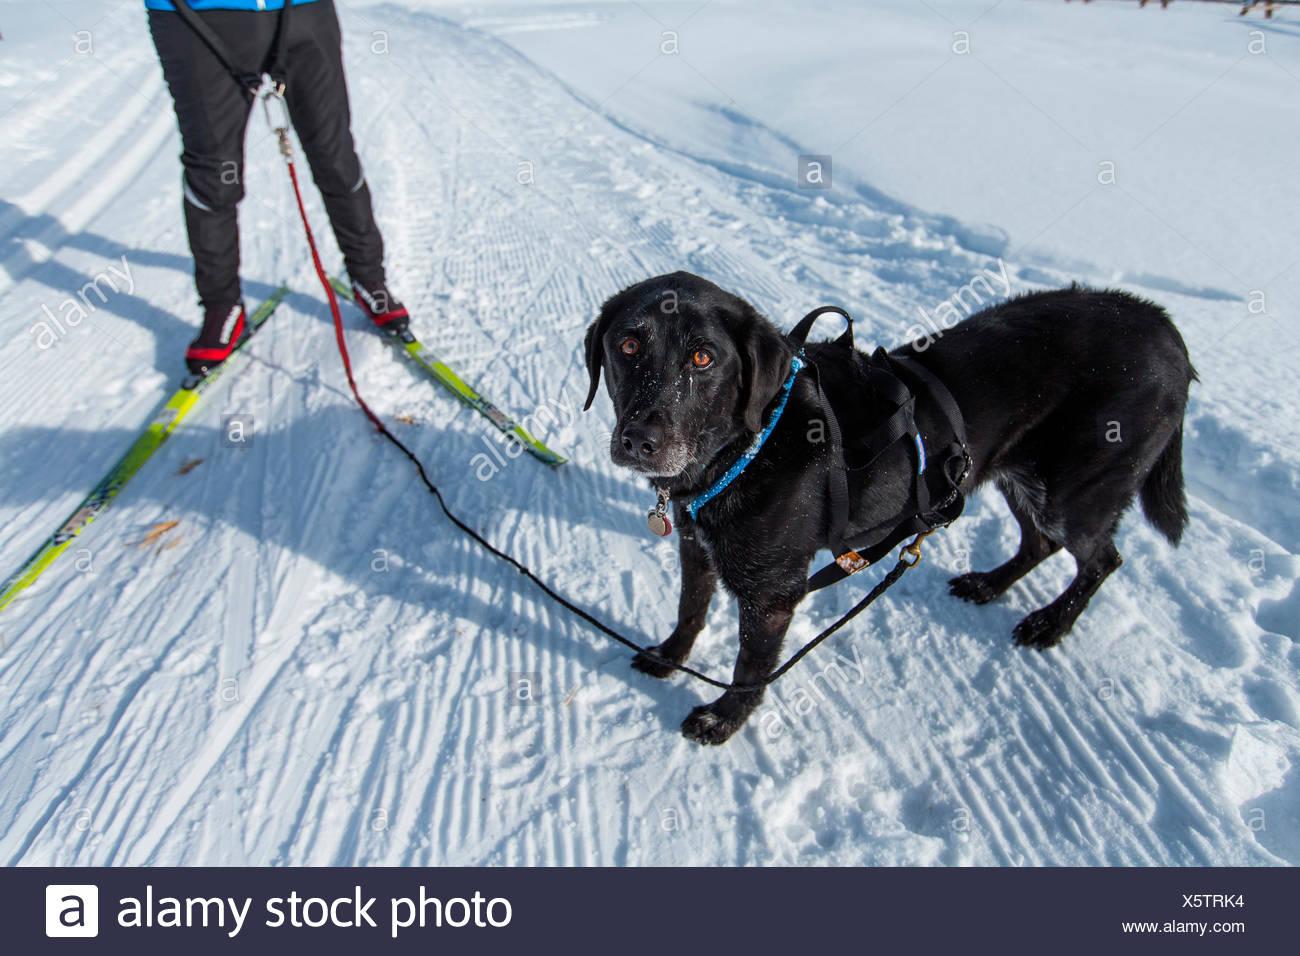 Colorado Ski Banque D'Images